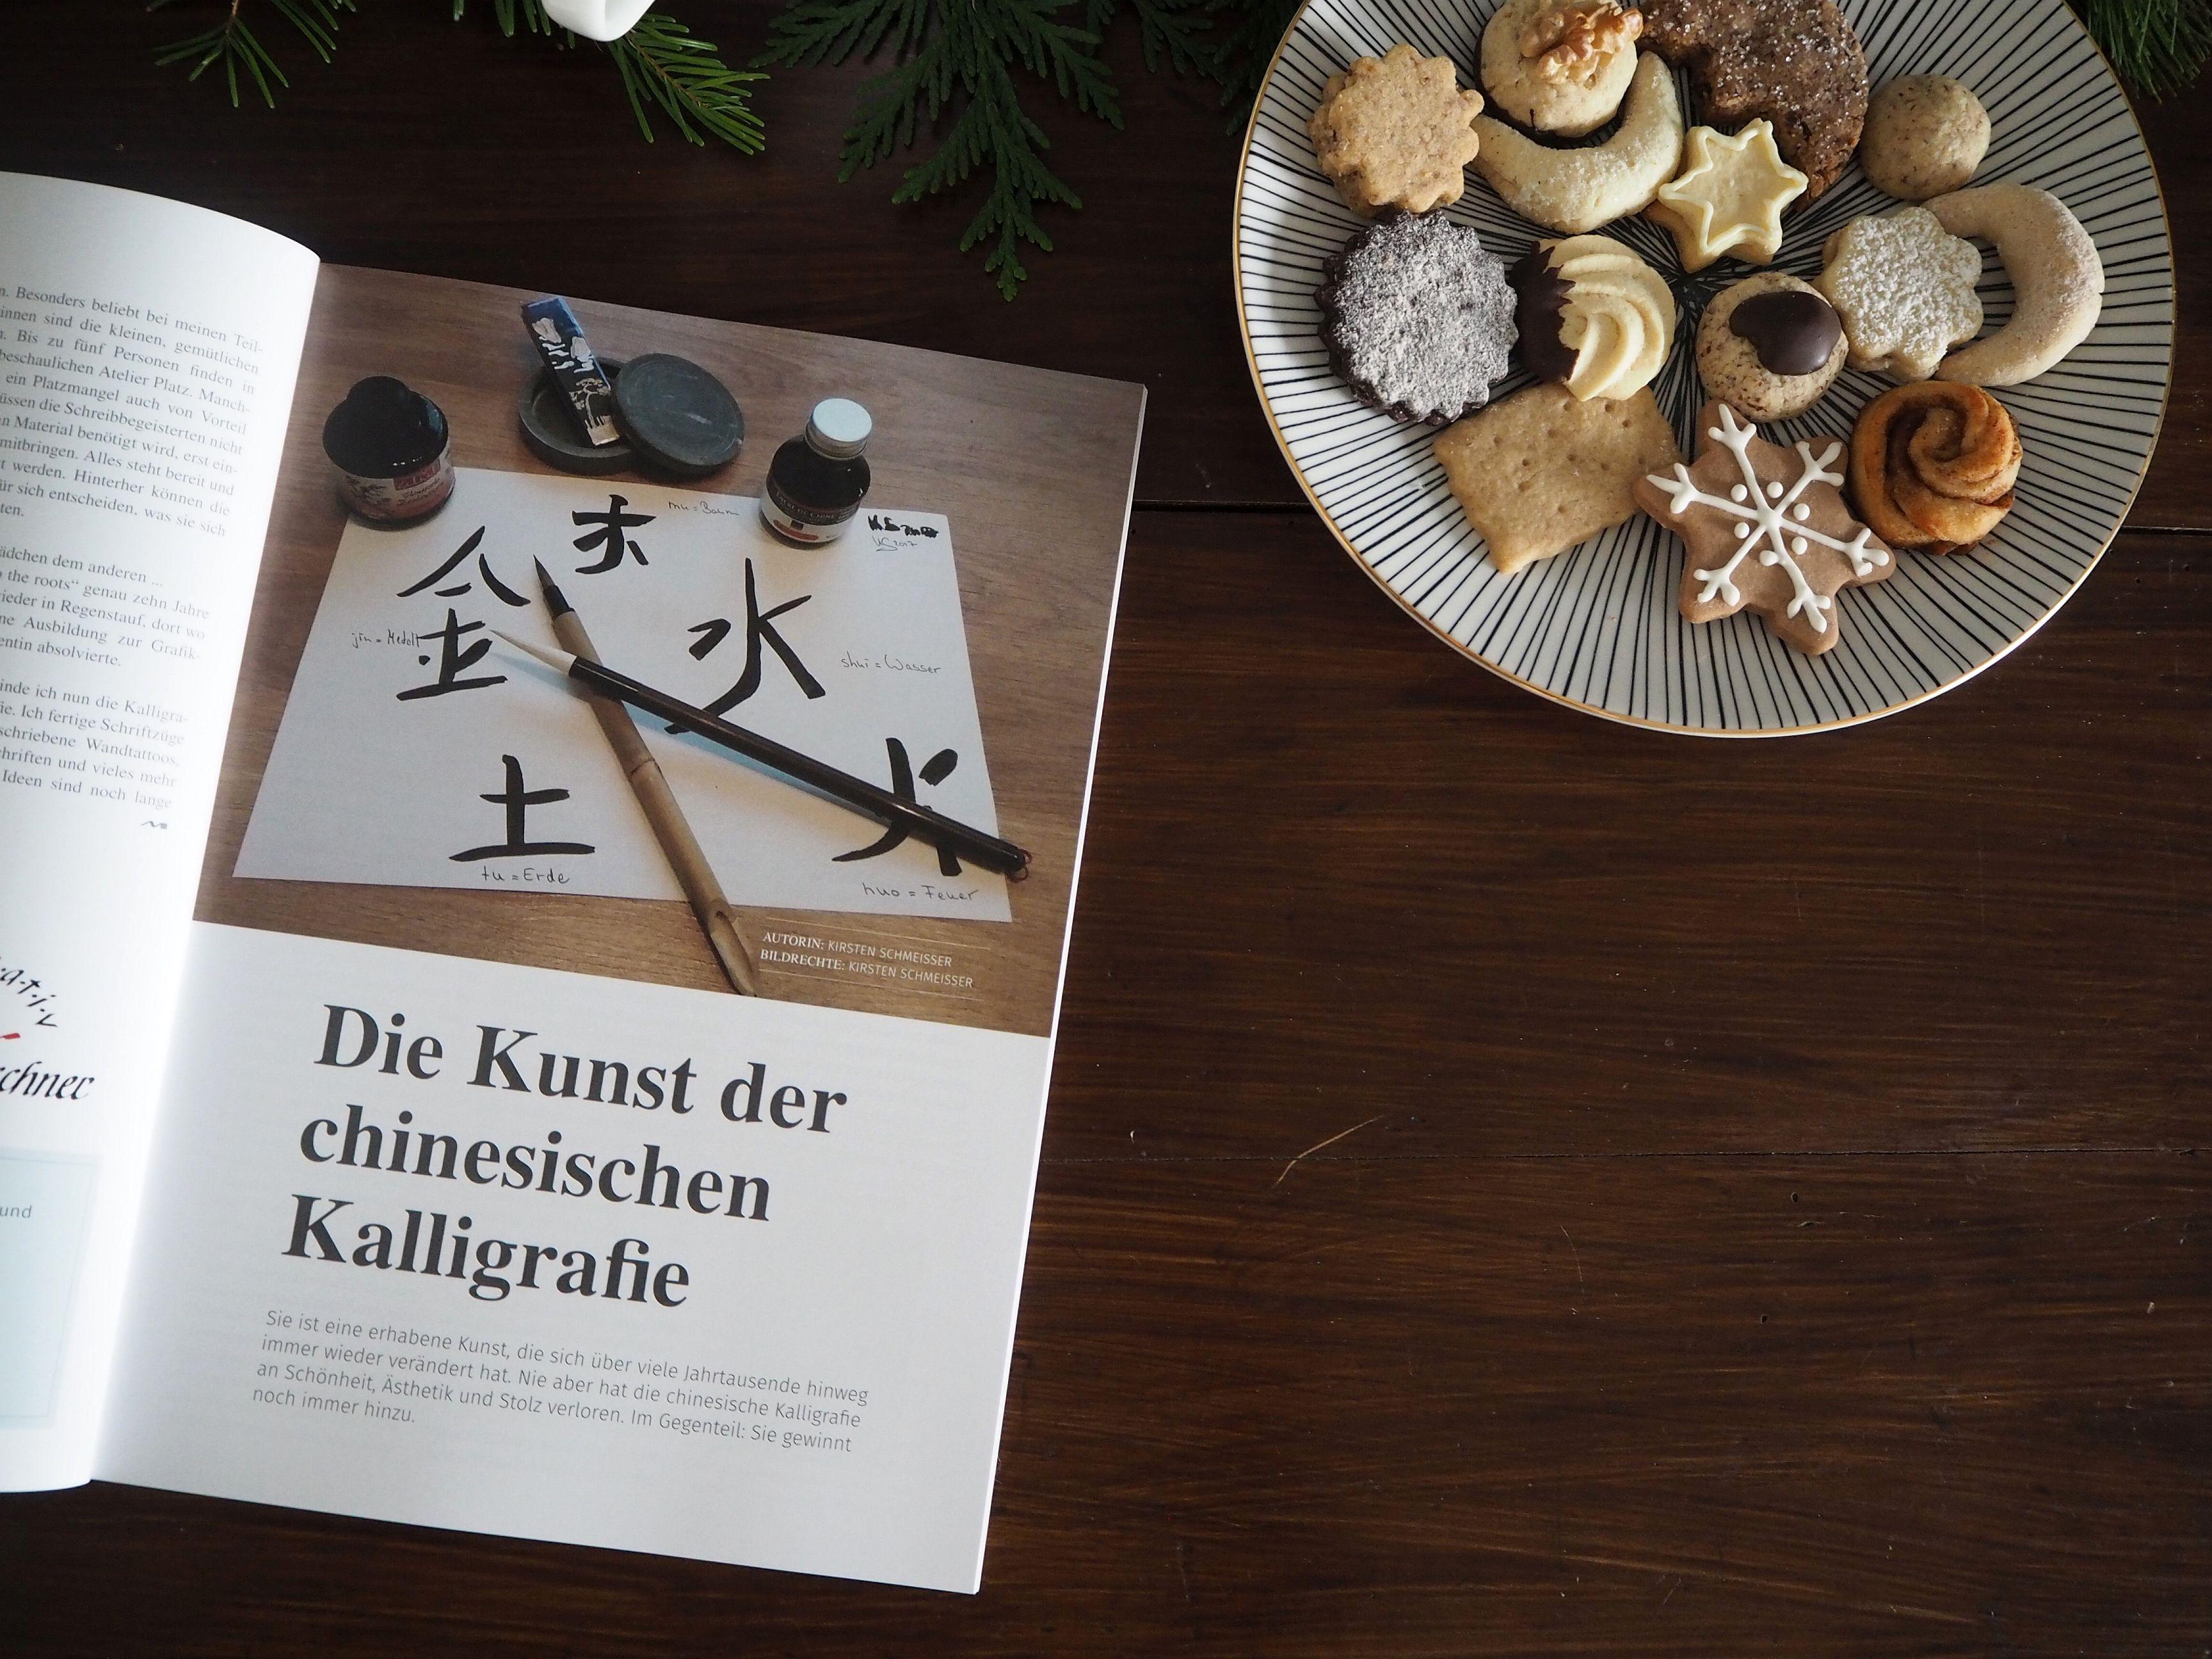 2017-12-skoen-och-kreativ-sonntagslektuere-zeitschrift-kalligrafie-aktuell (6)